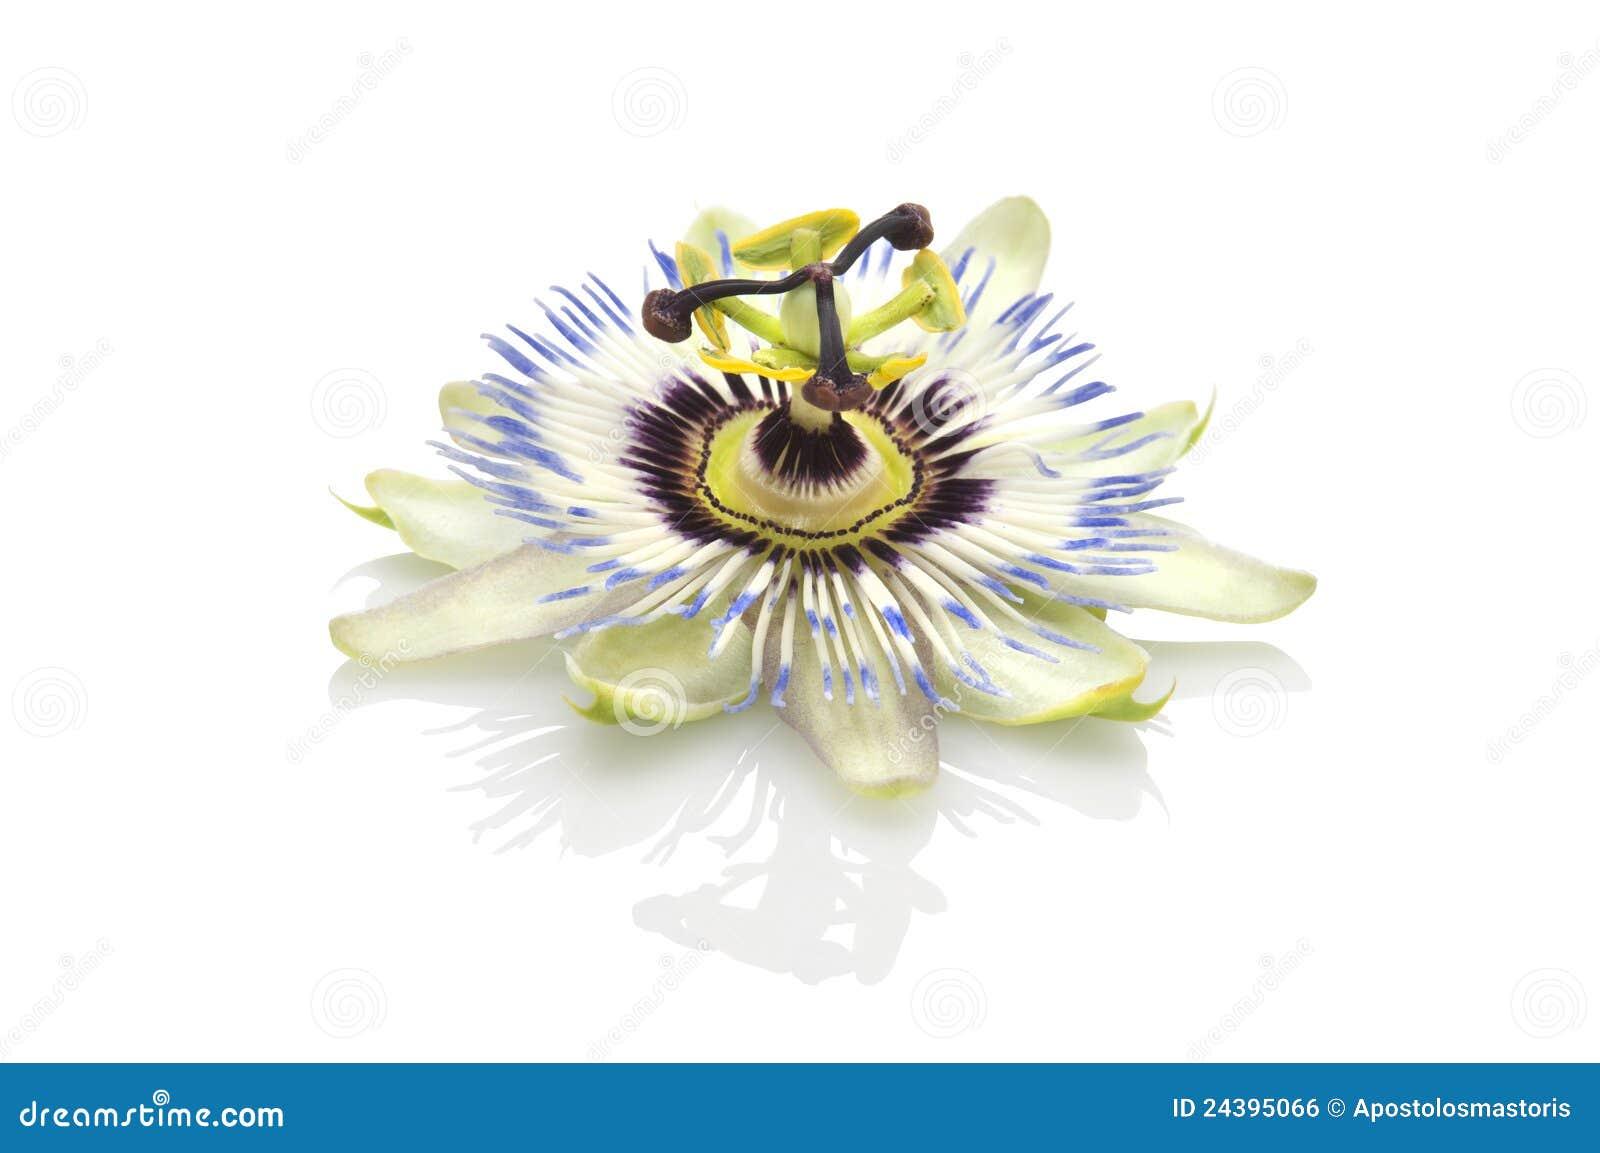 Passion flower(passiflora)